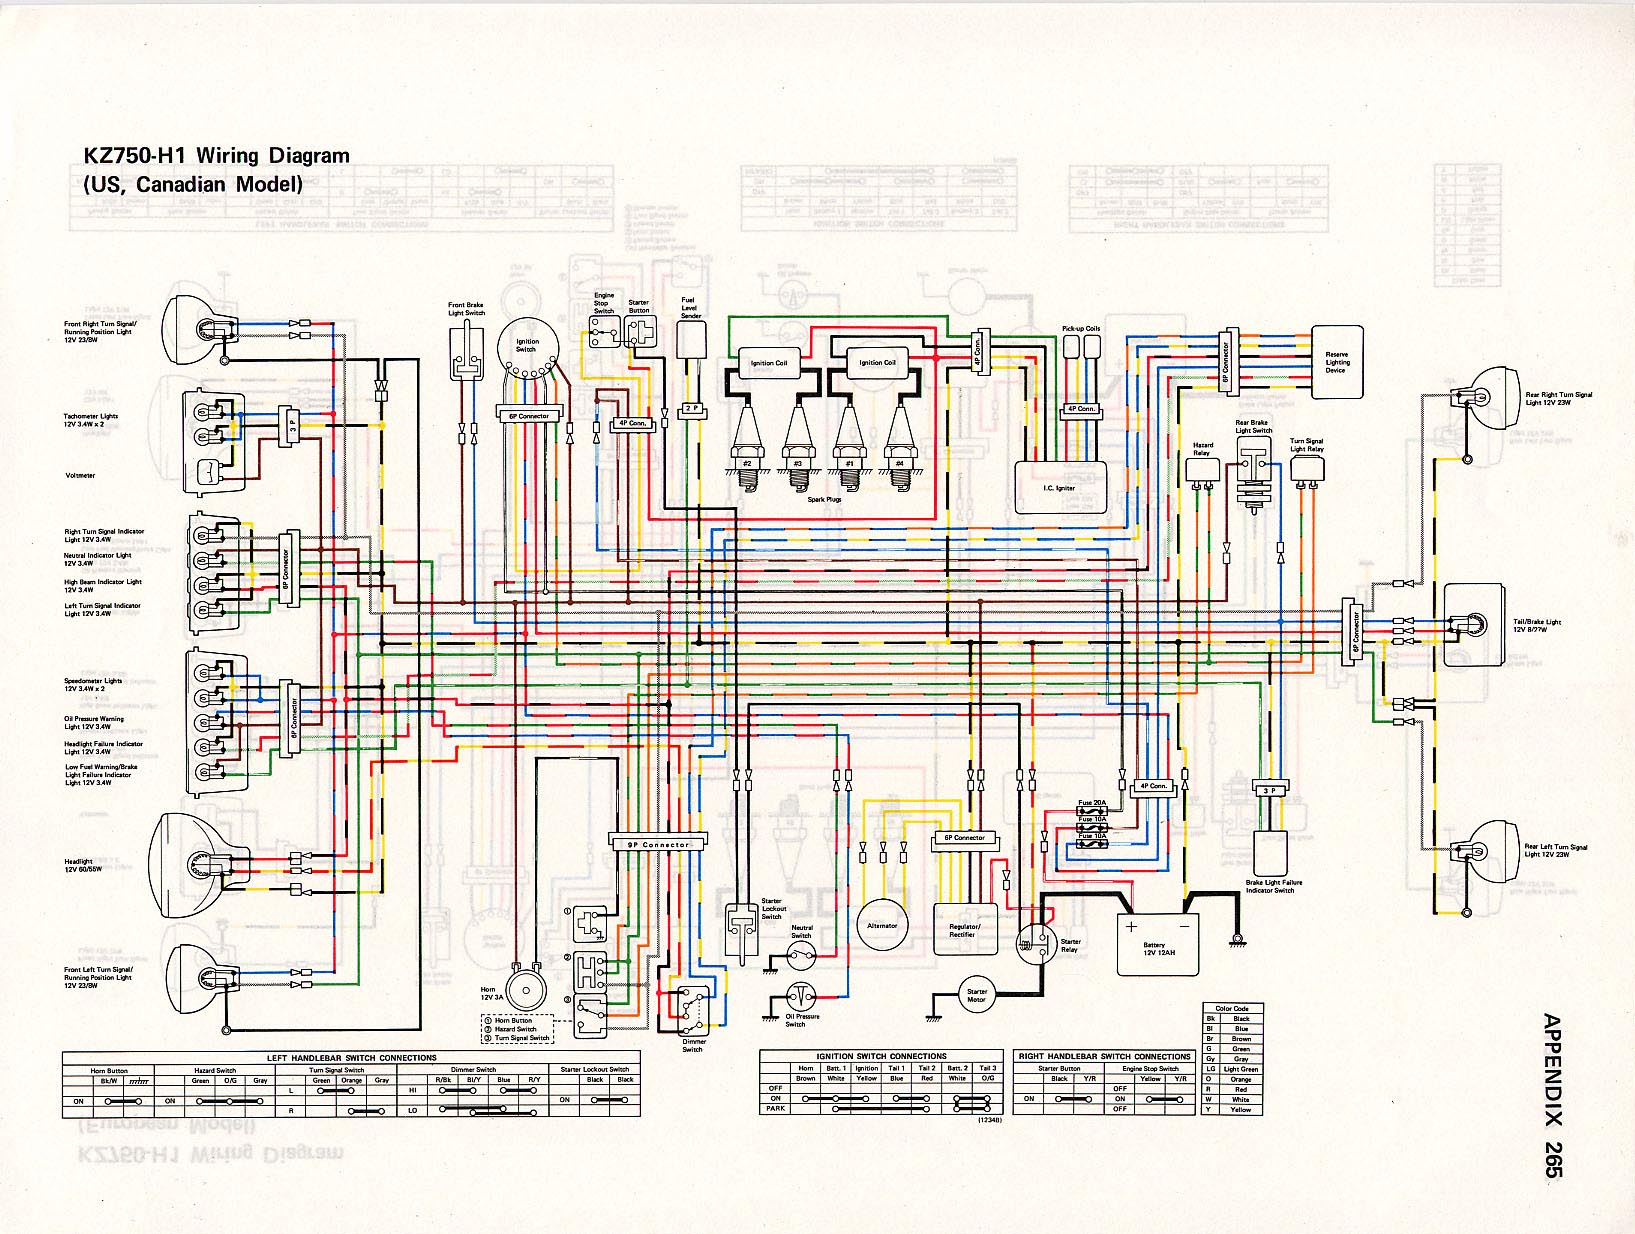 zx750 wiring diagram 49 mercury auto mobile wiring diagrams Hummer H2 Parts Diagram  Chevrolet Colorado Wiring-Diagram Hummer H2 Radio Wiring Diagram 1996 Yukon Fuel Pump Wire Diagram